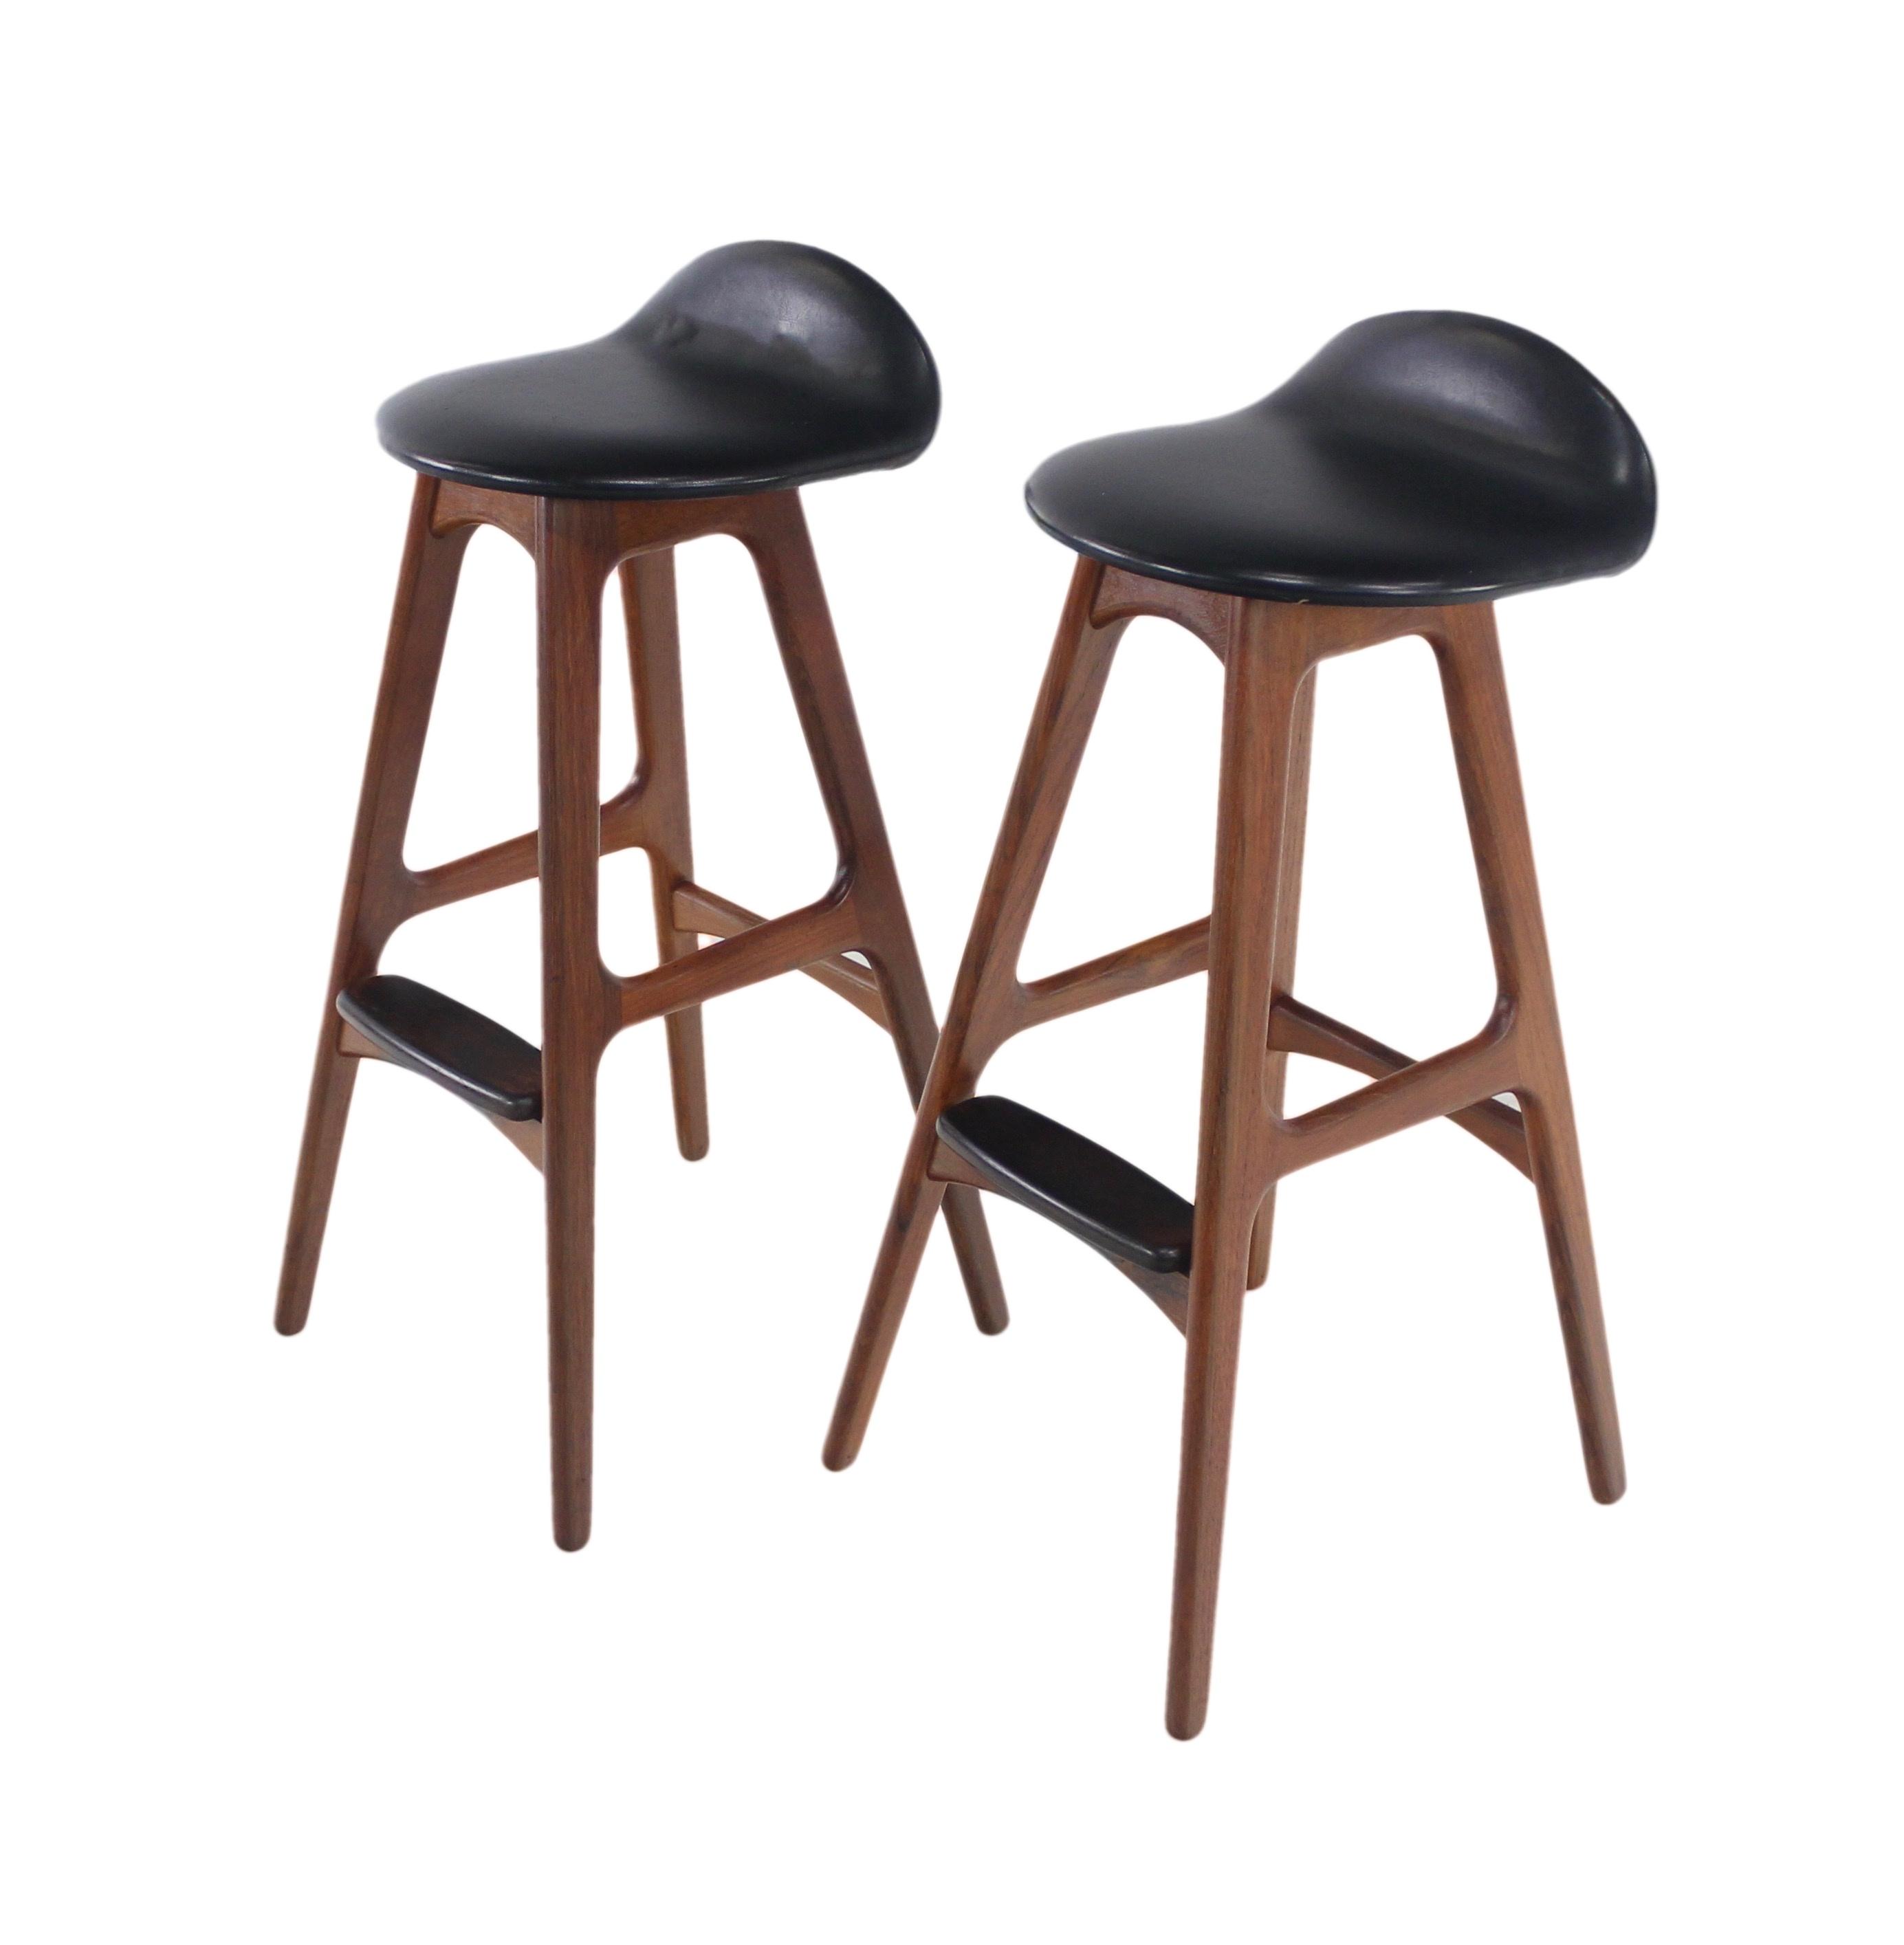 Luxury Double Seat Bar Stools